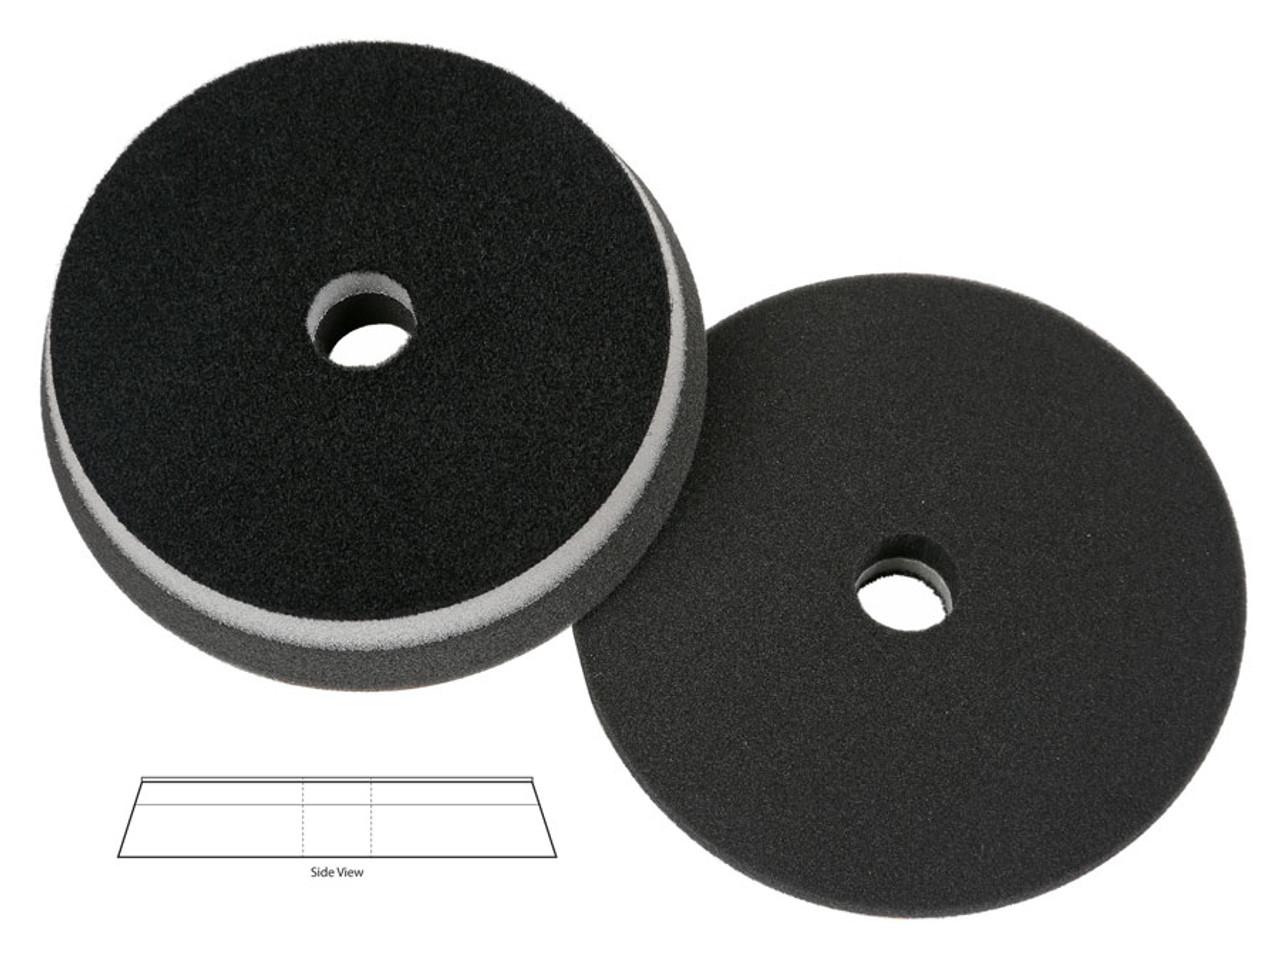 "Lake Country Black HDO 6.5"" x 1""  Foam Orbital Finishing Pad Fits 6"" Backing Plate"